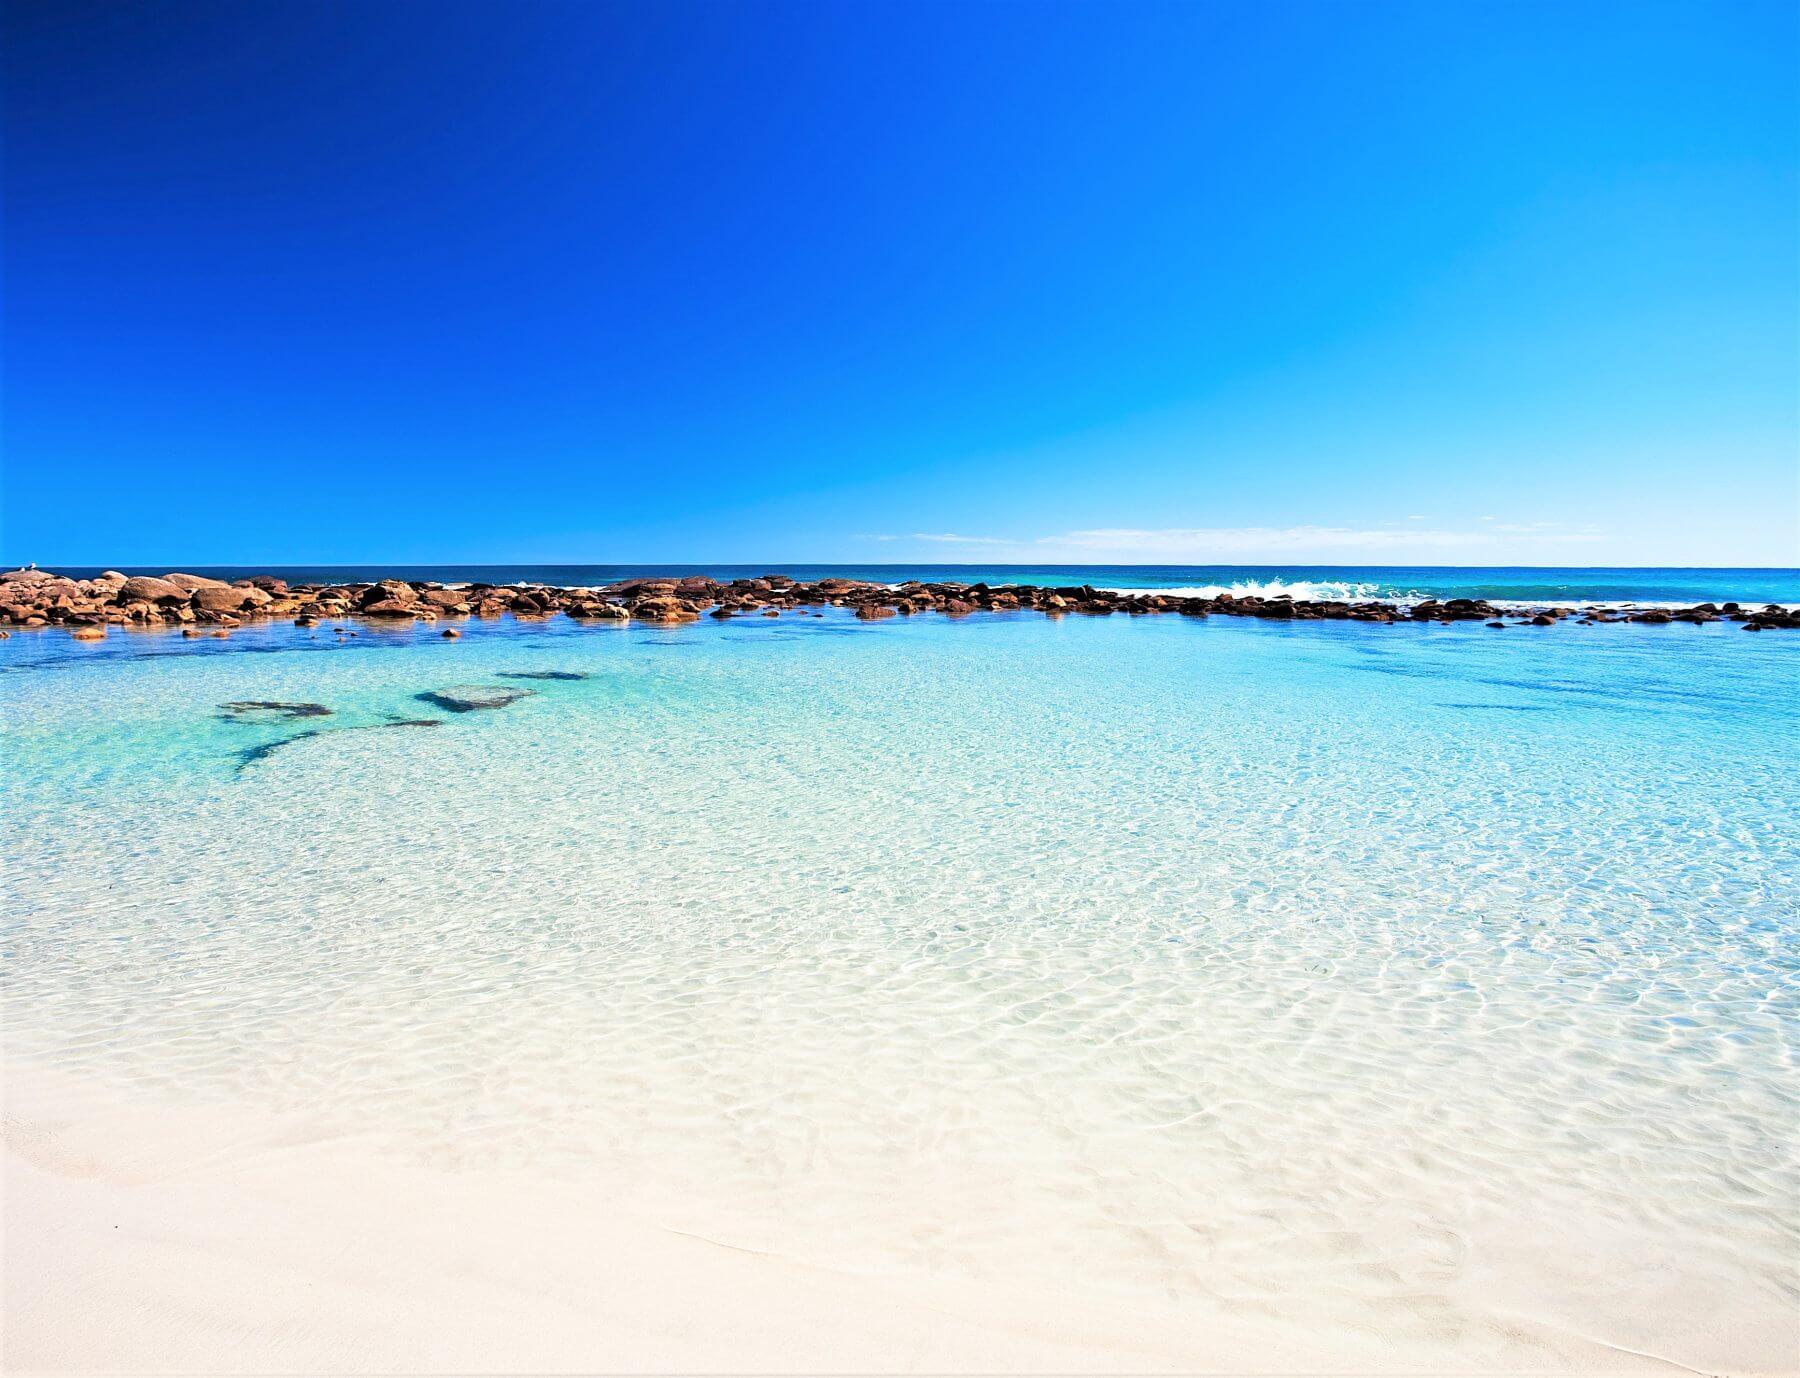 Strand auf Kangaroo Island - Stokes Bay Beach